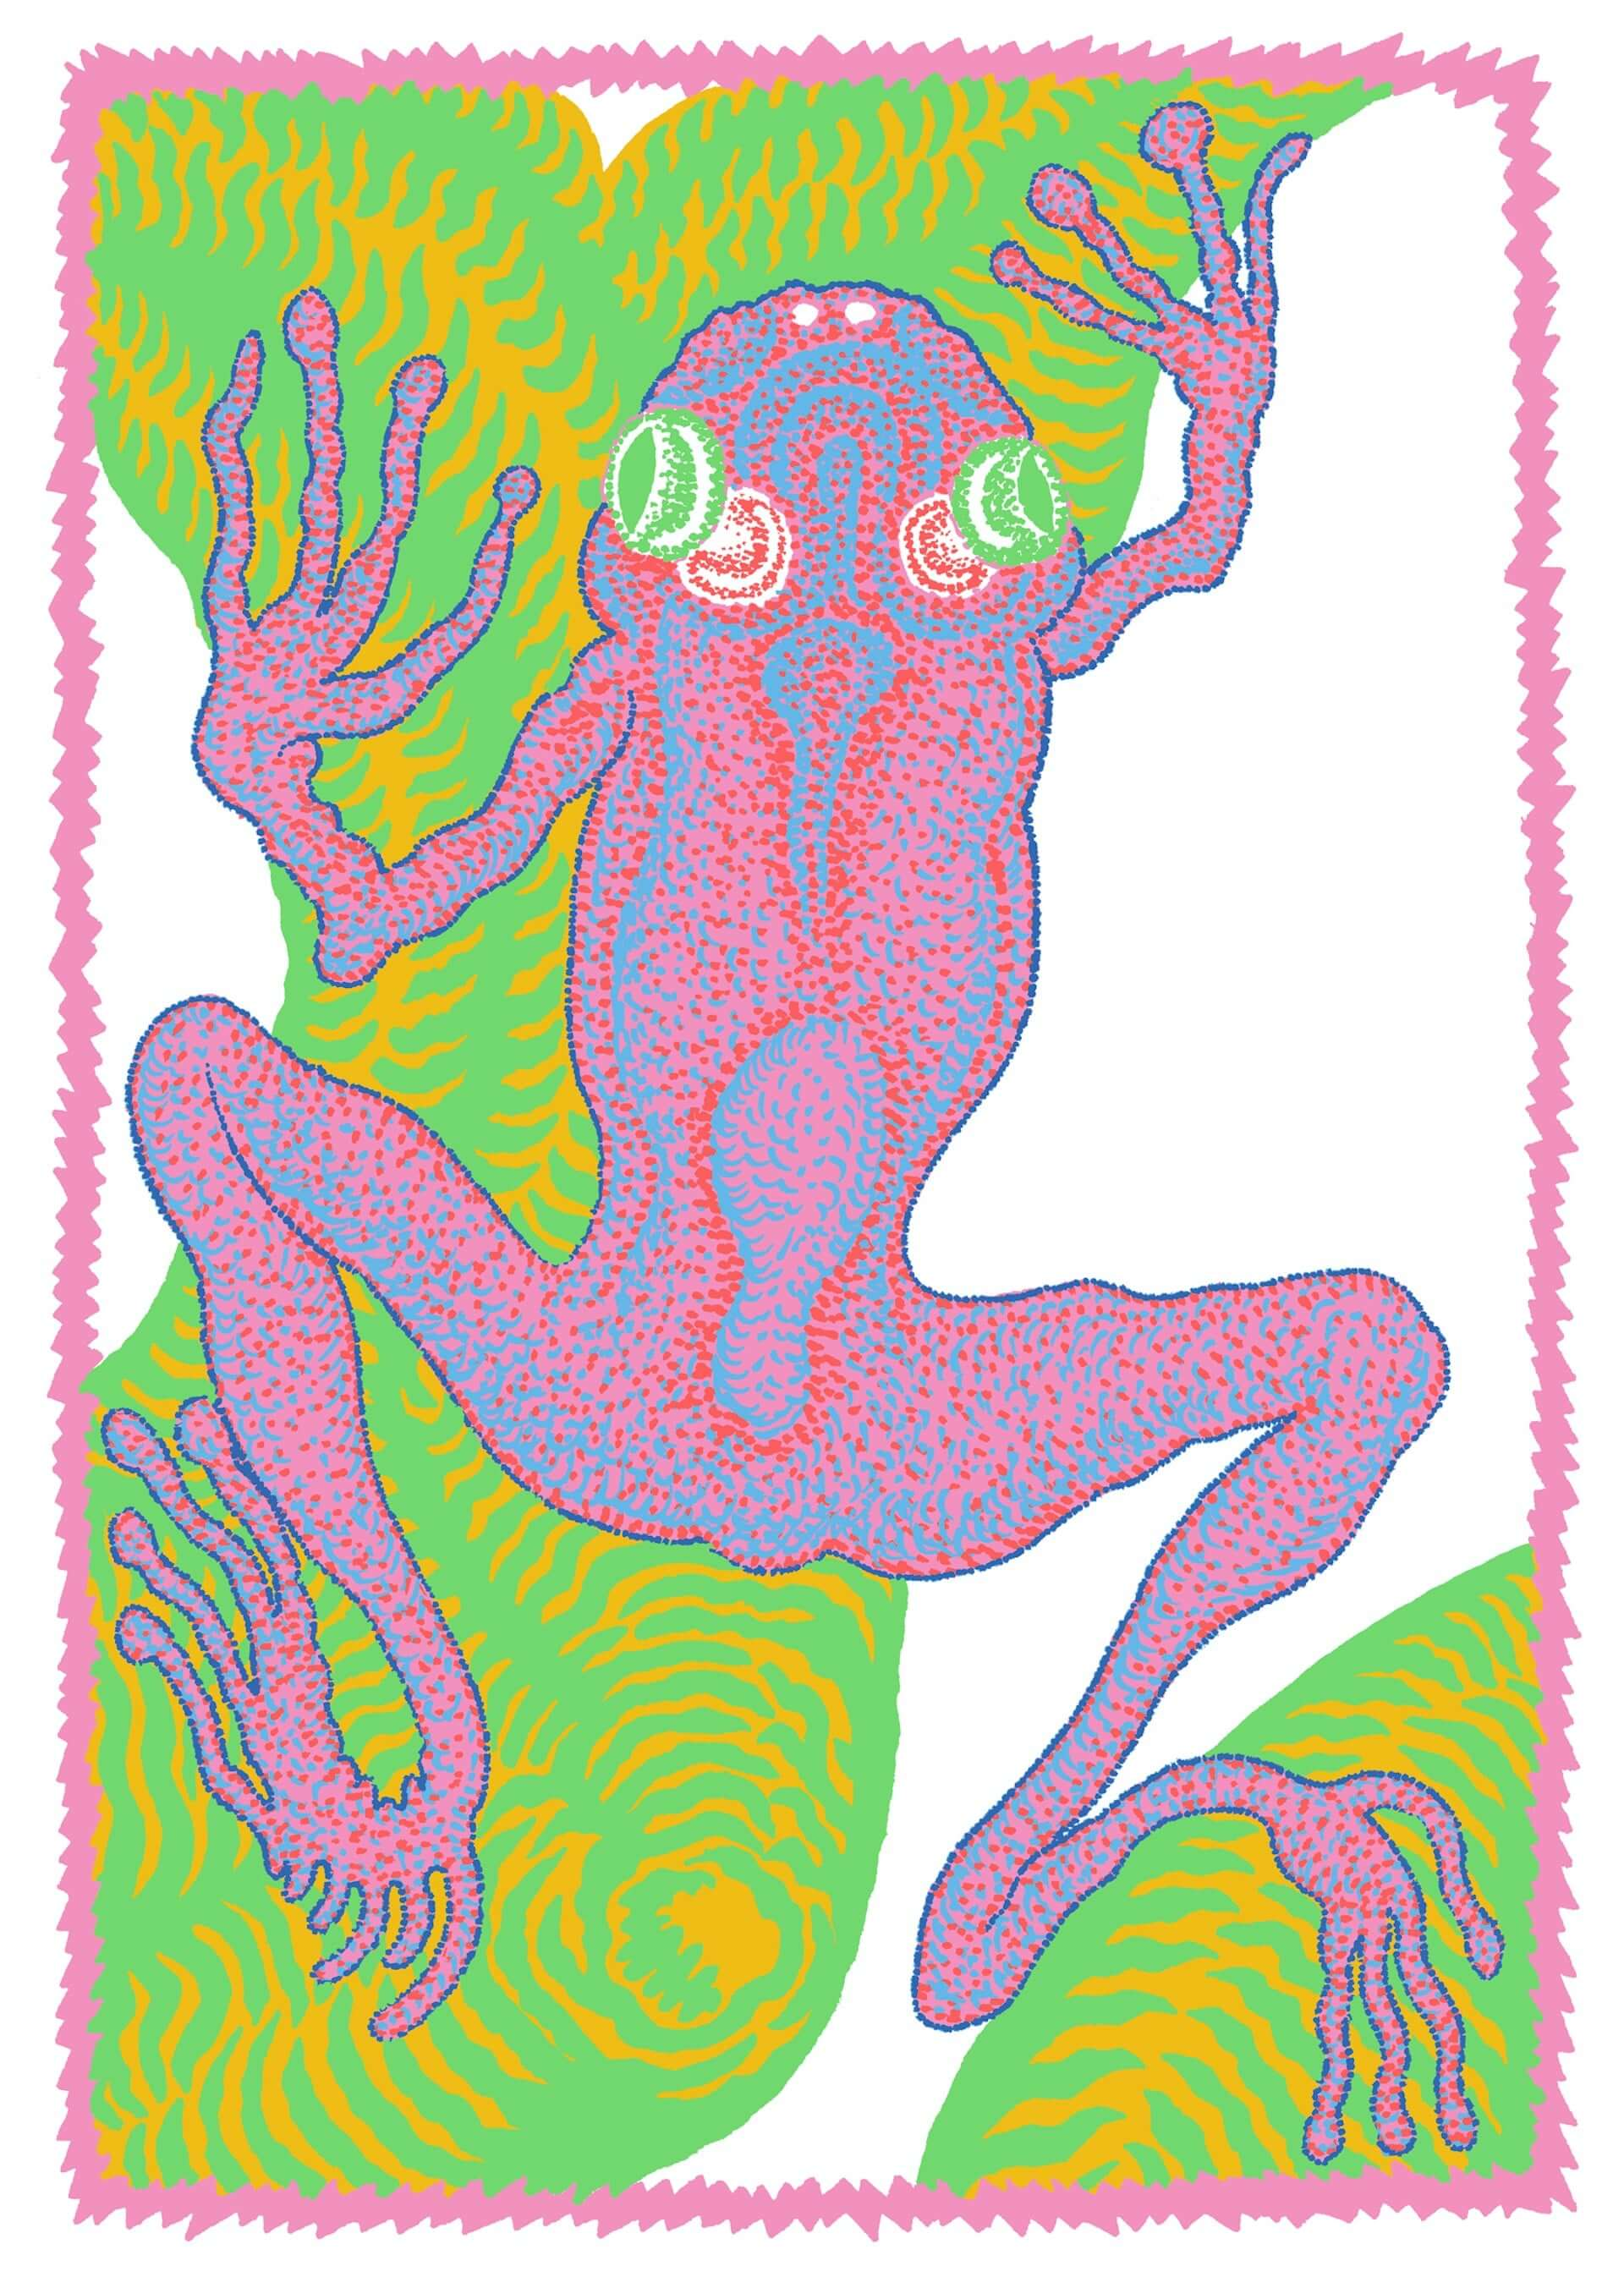 TETSUNORI TAWARAYAのアート展が「RVCA STORE SHIBUYA Gallery」にて開催決定!アーカイブ作品など期間限定で展示 art201125_tetsunori-tawaraya_11-1920x2692